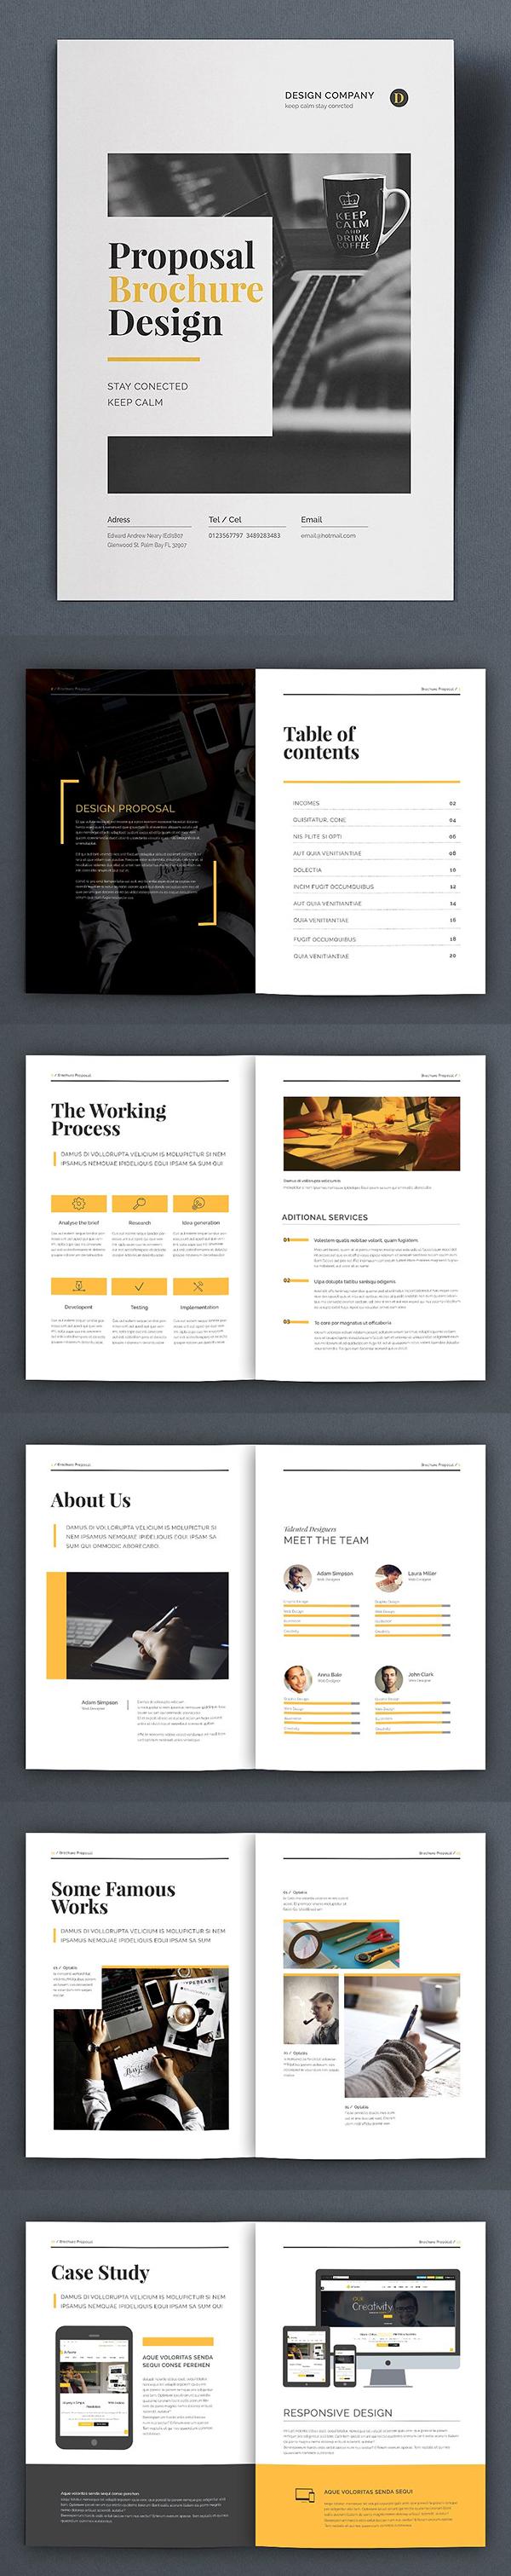 100 Professional Corporate Brochure Templates - 86